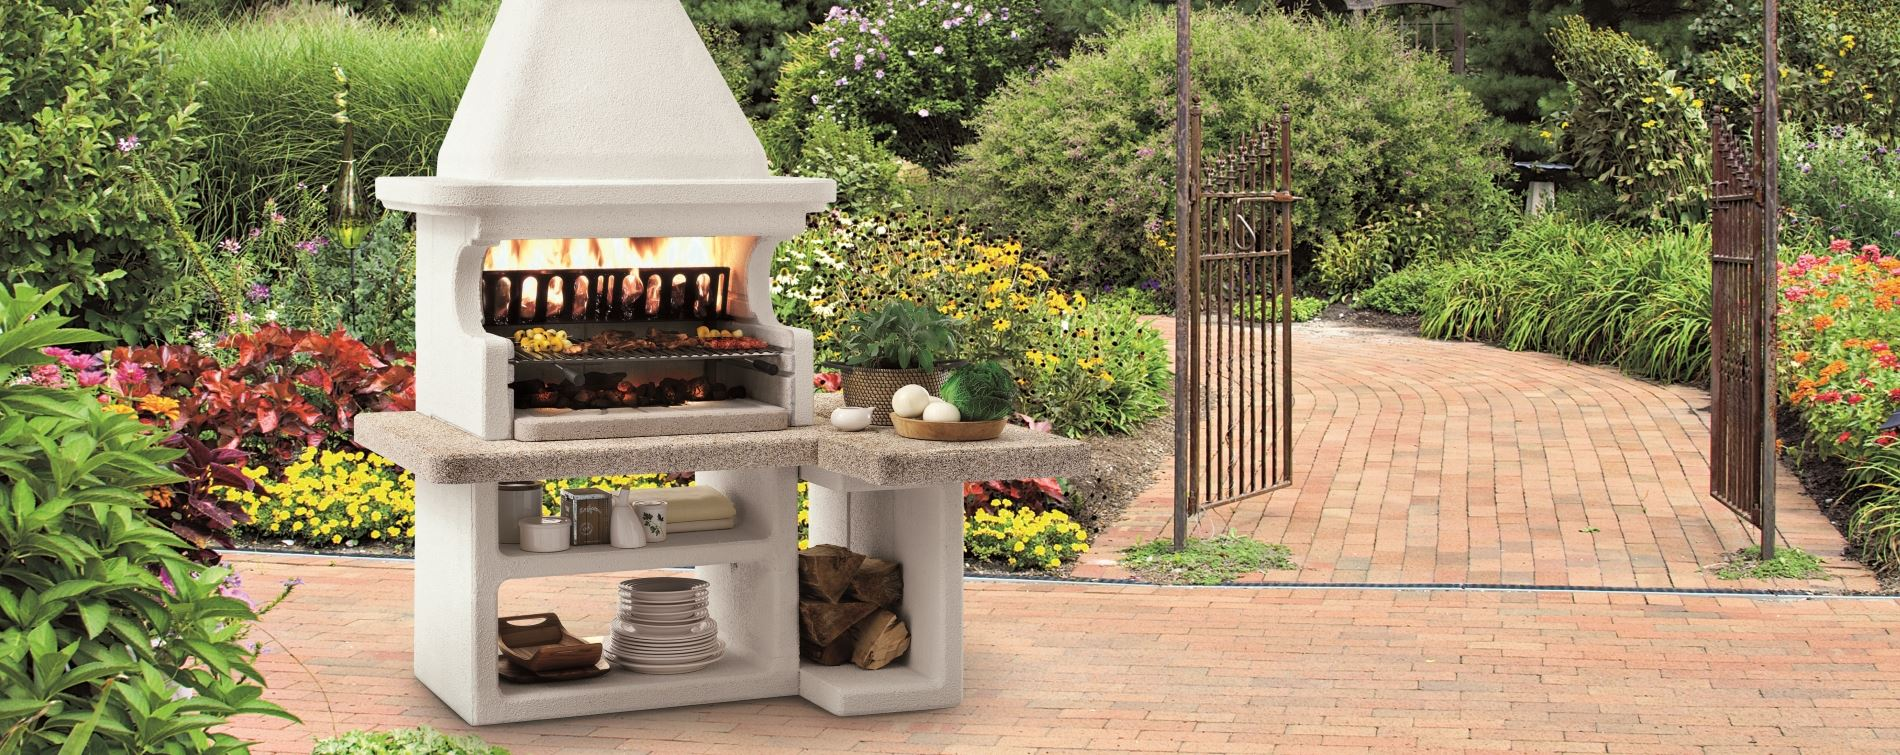 barbecue_arredo_giardino_slide